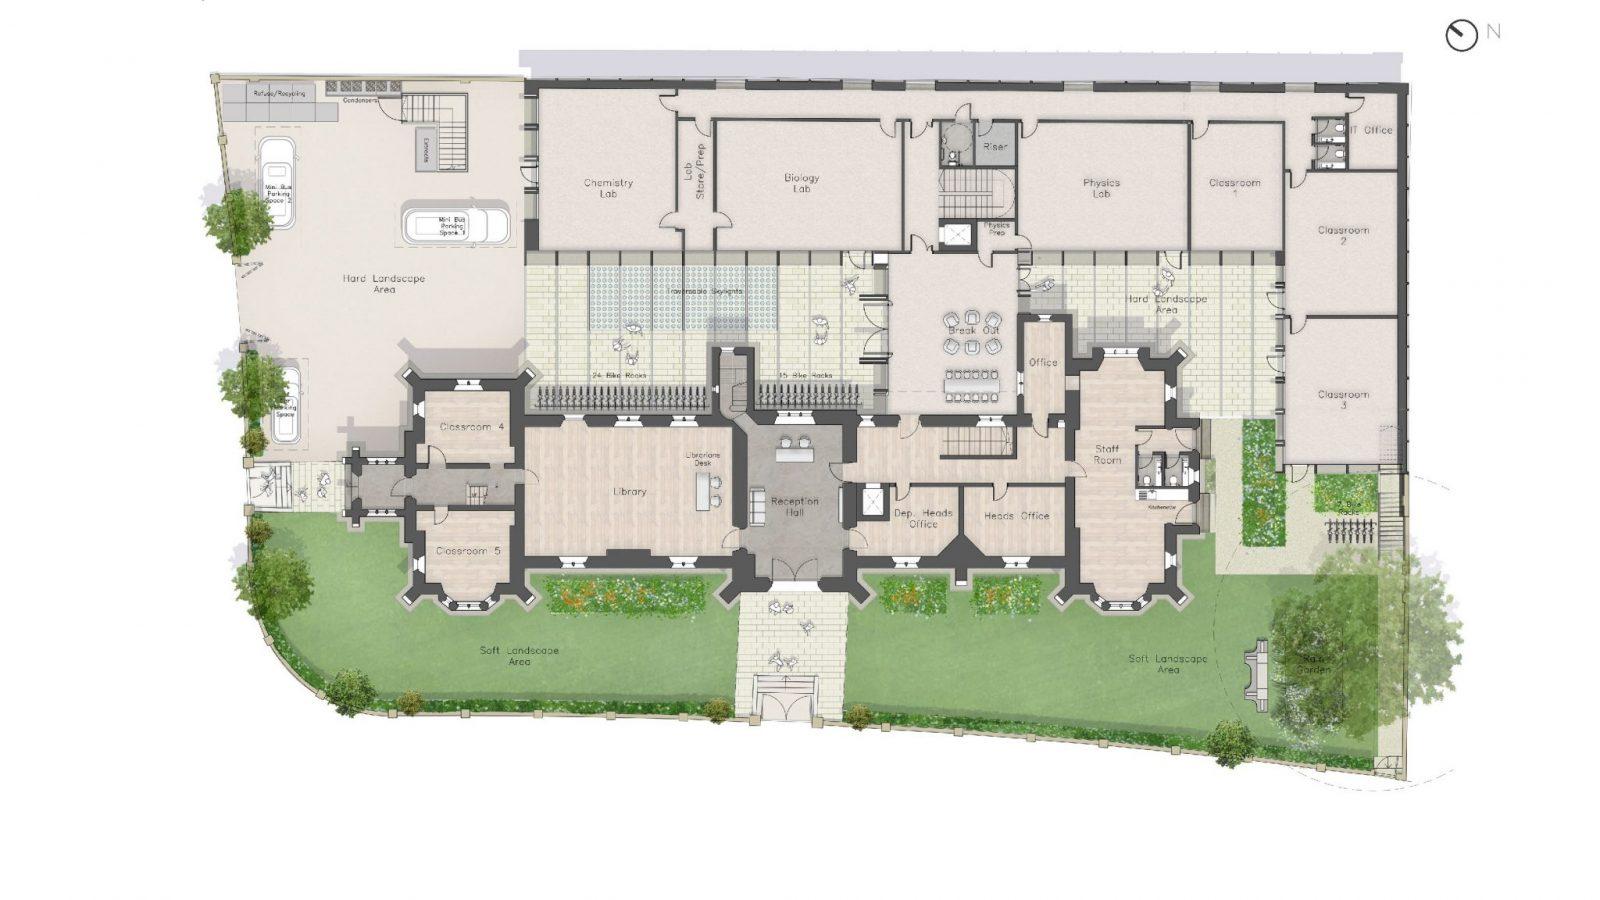 Plan, Ground Floor - The Castle Club School, Fulham, London SW6